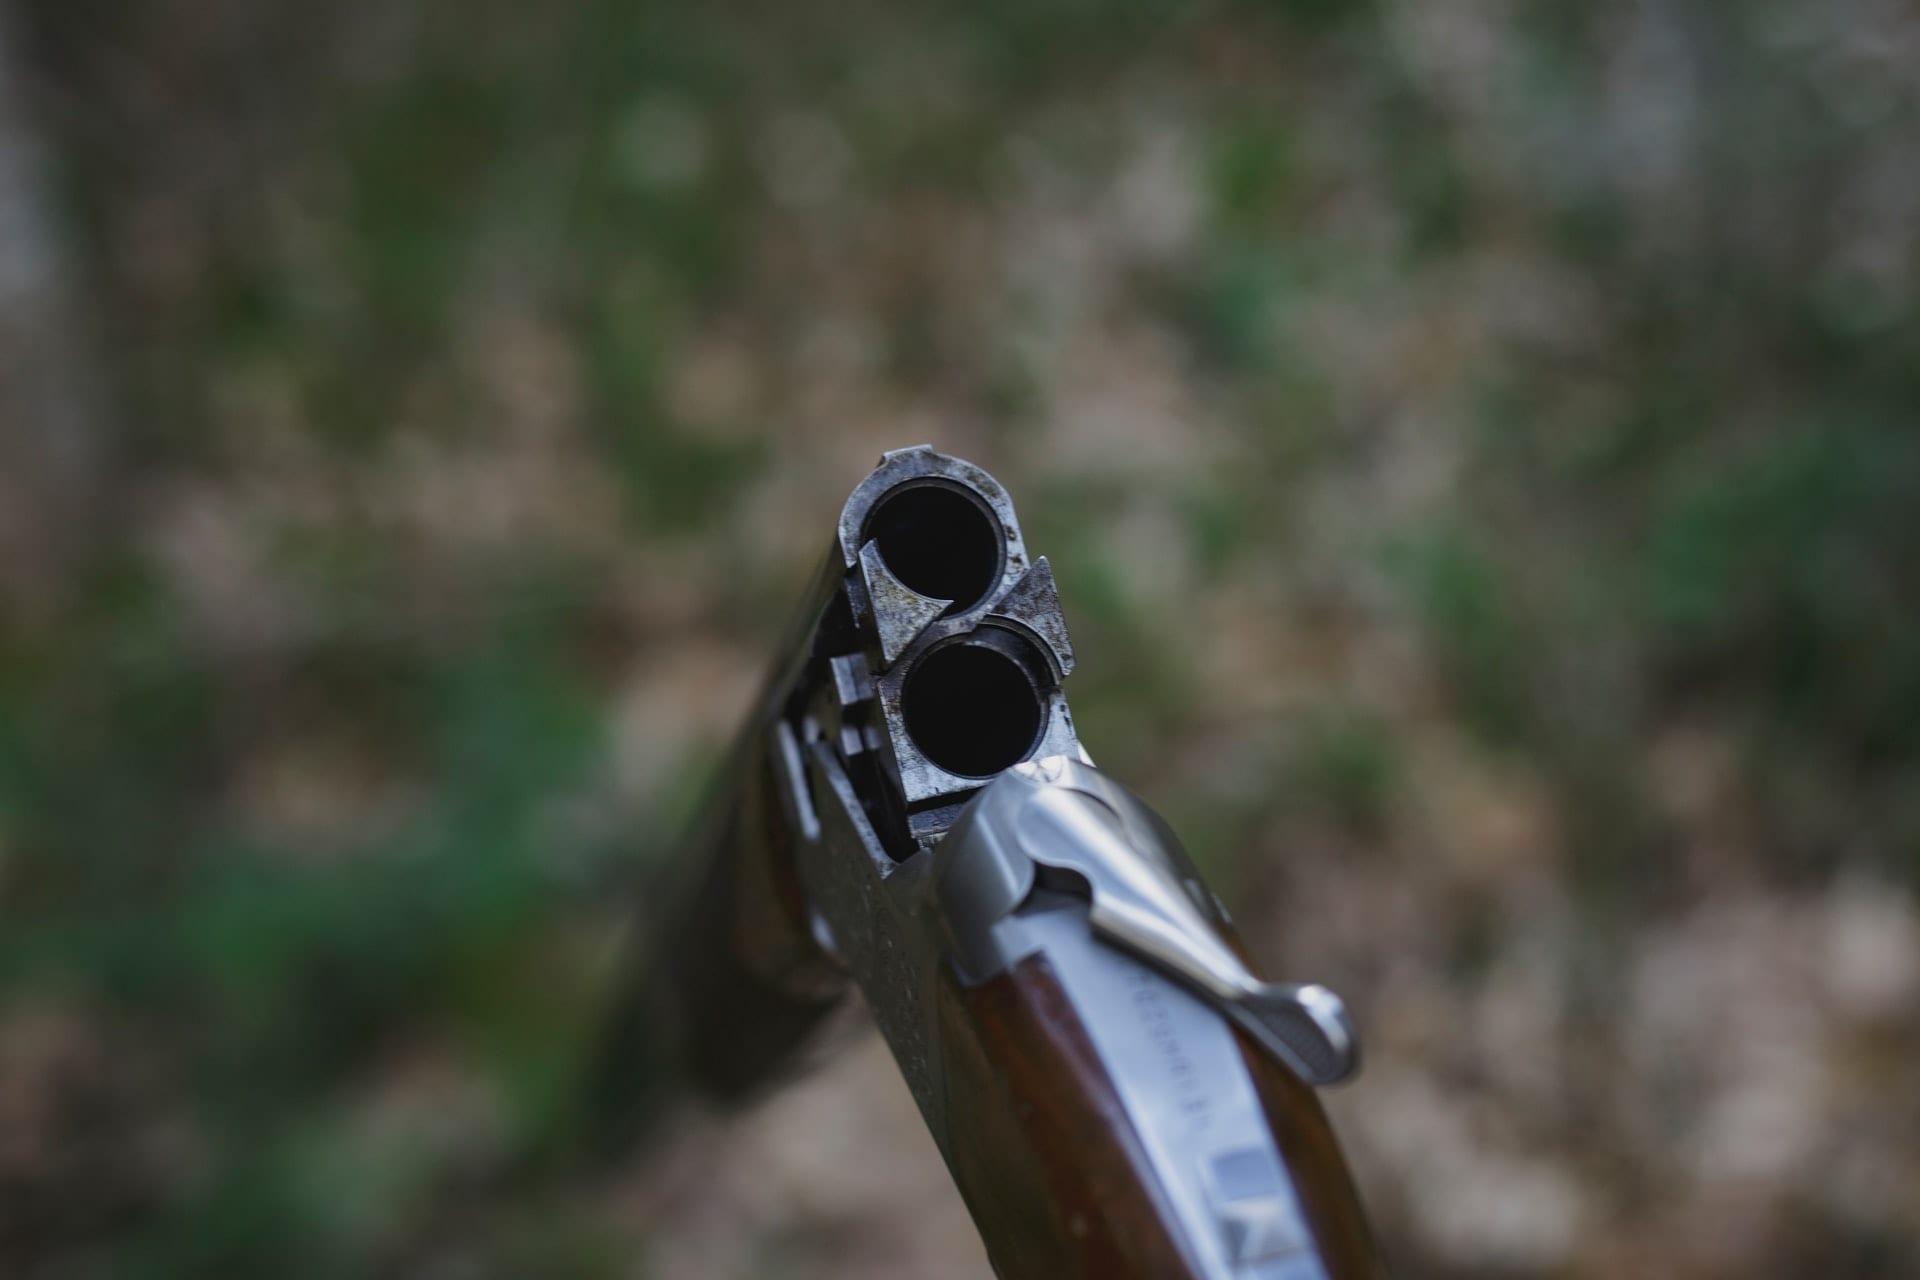 do shotgun shells get old and dangerous